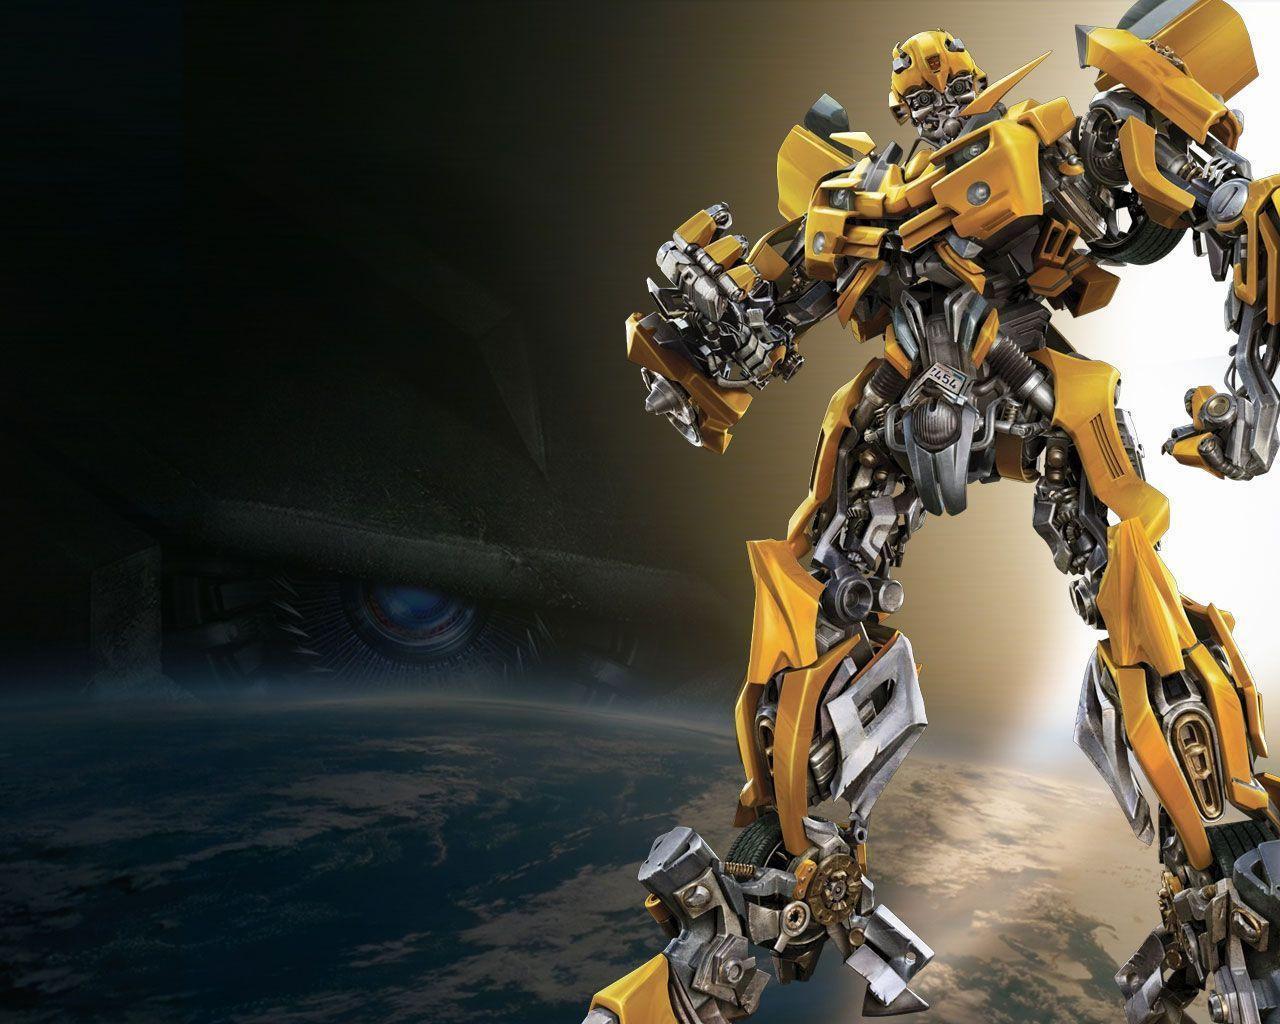 Transformers 2 Bumblebee Wallpapers 1280x1024